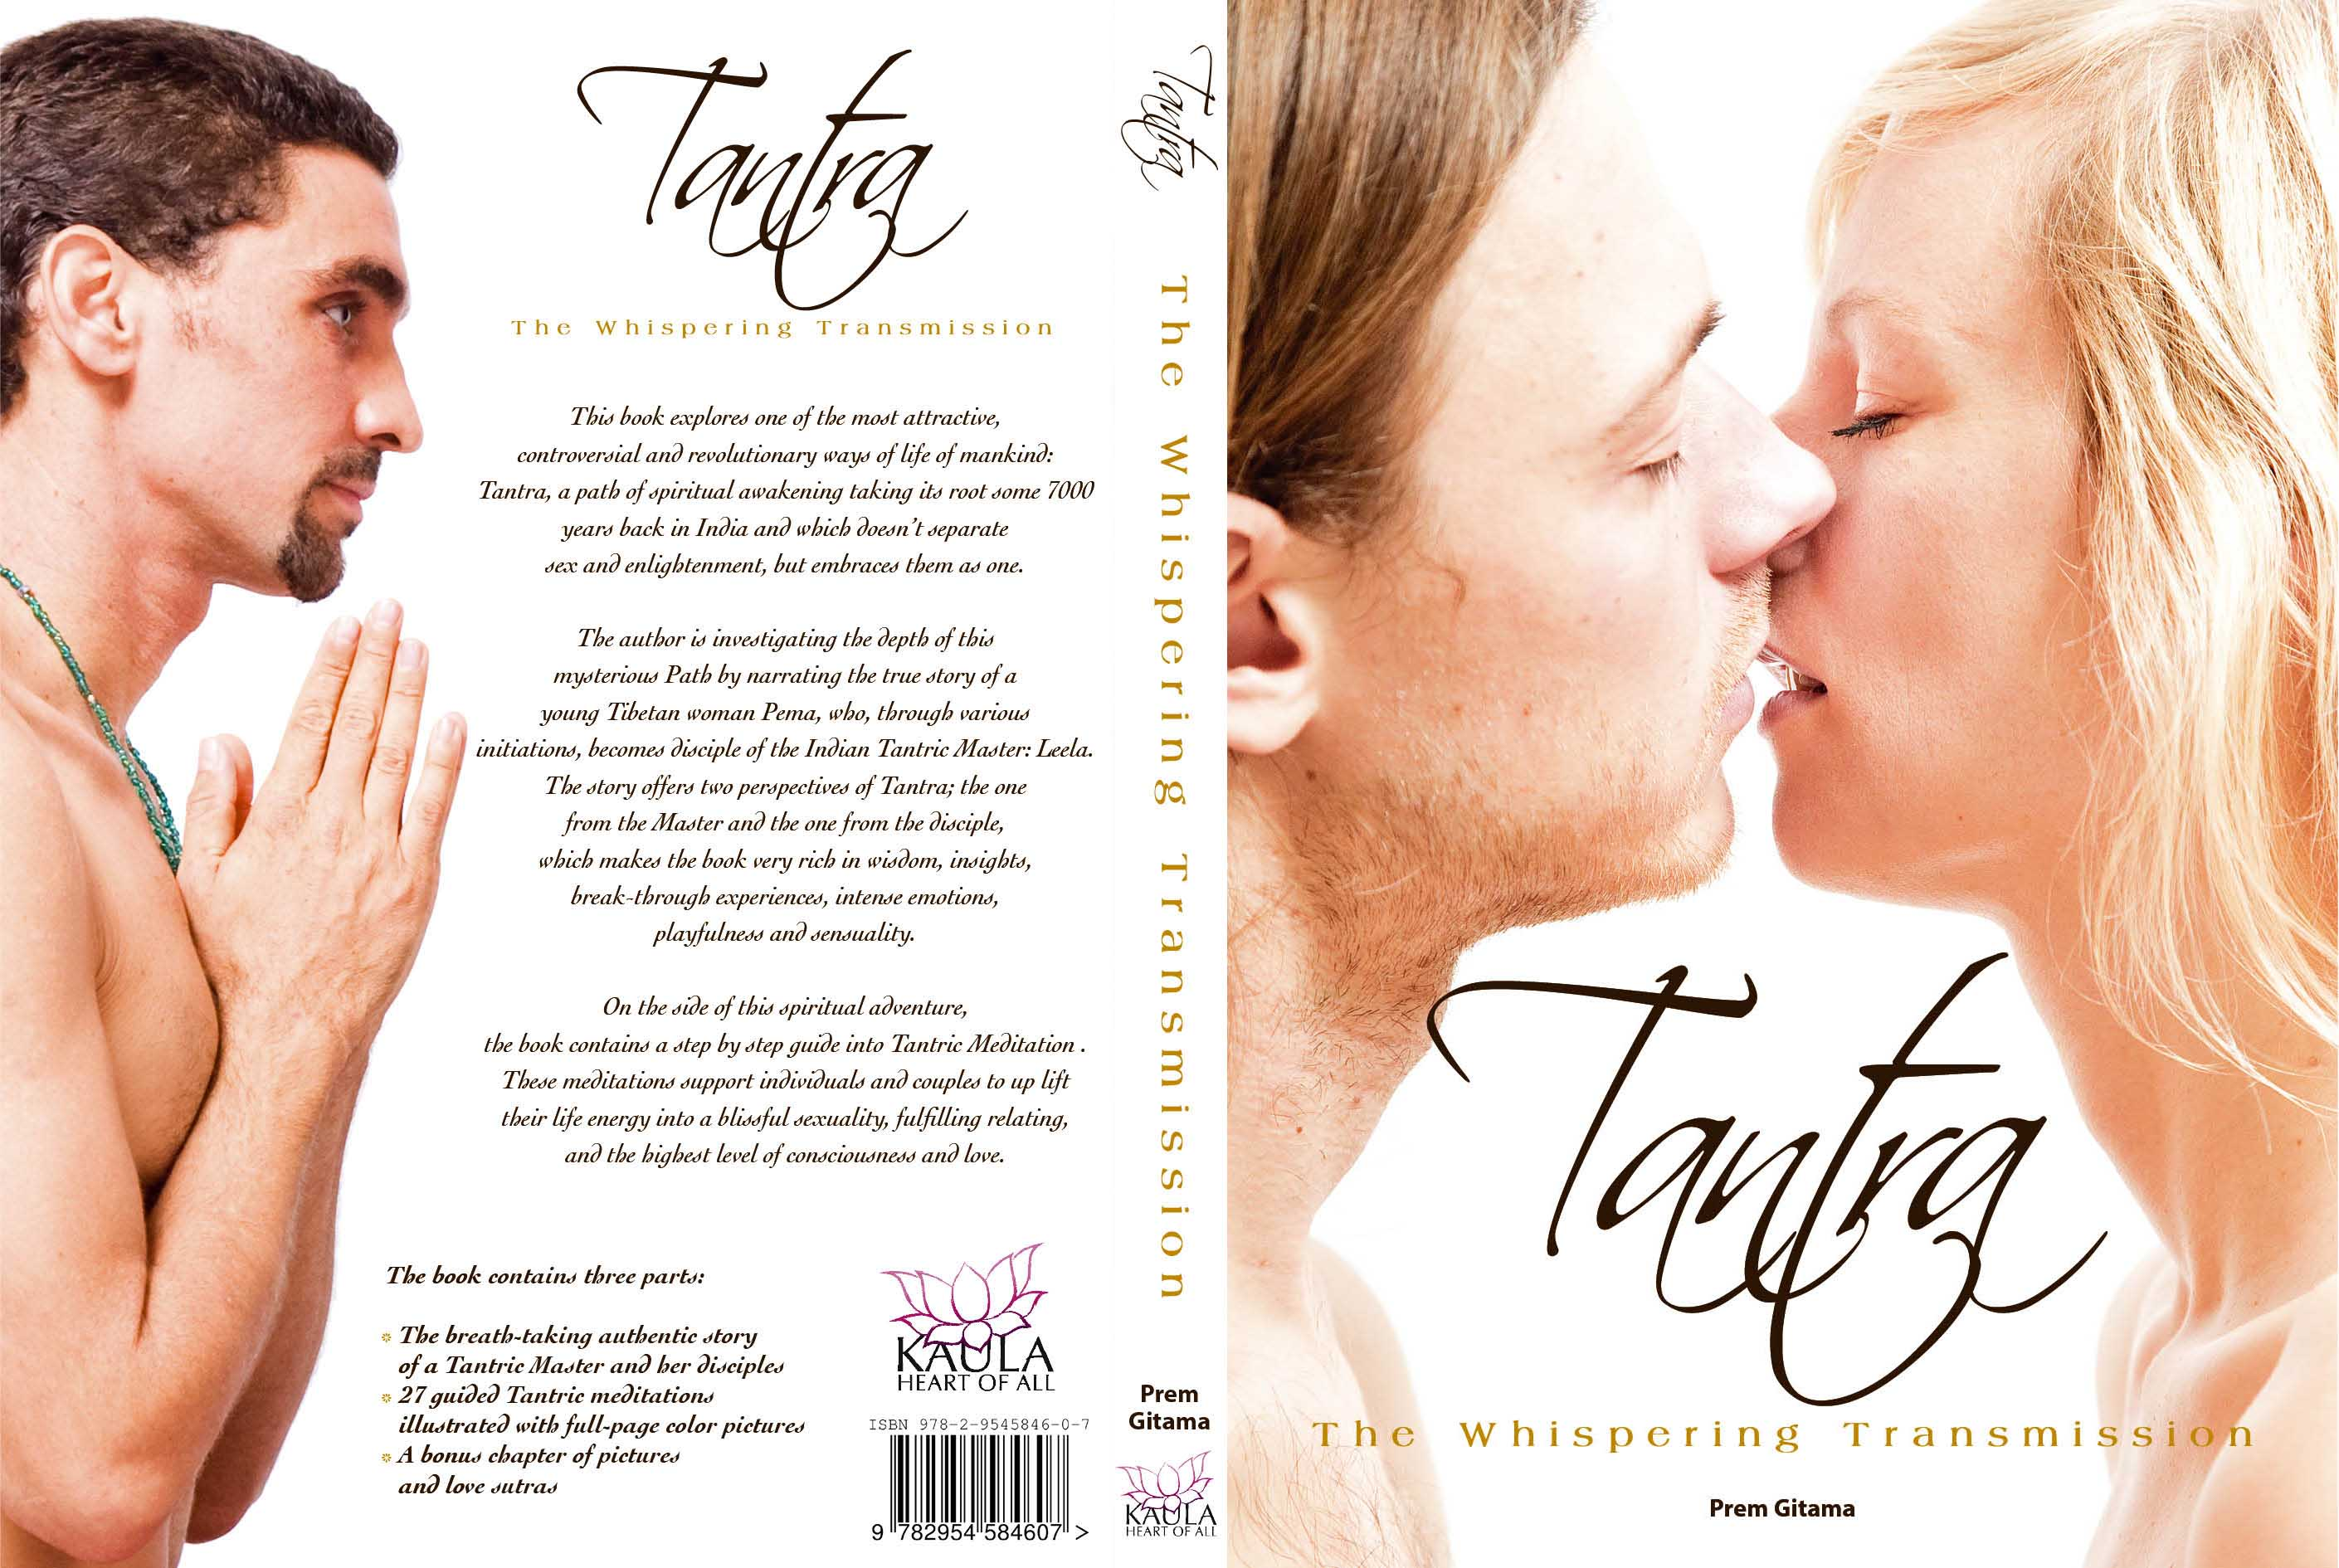 Whispering Transmission cover